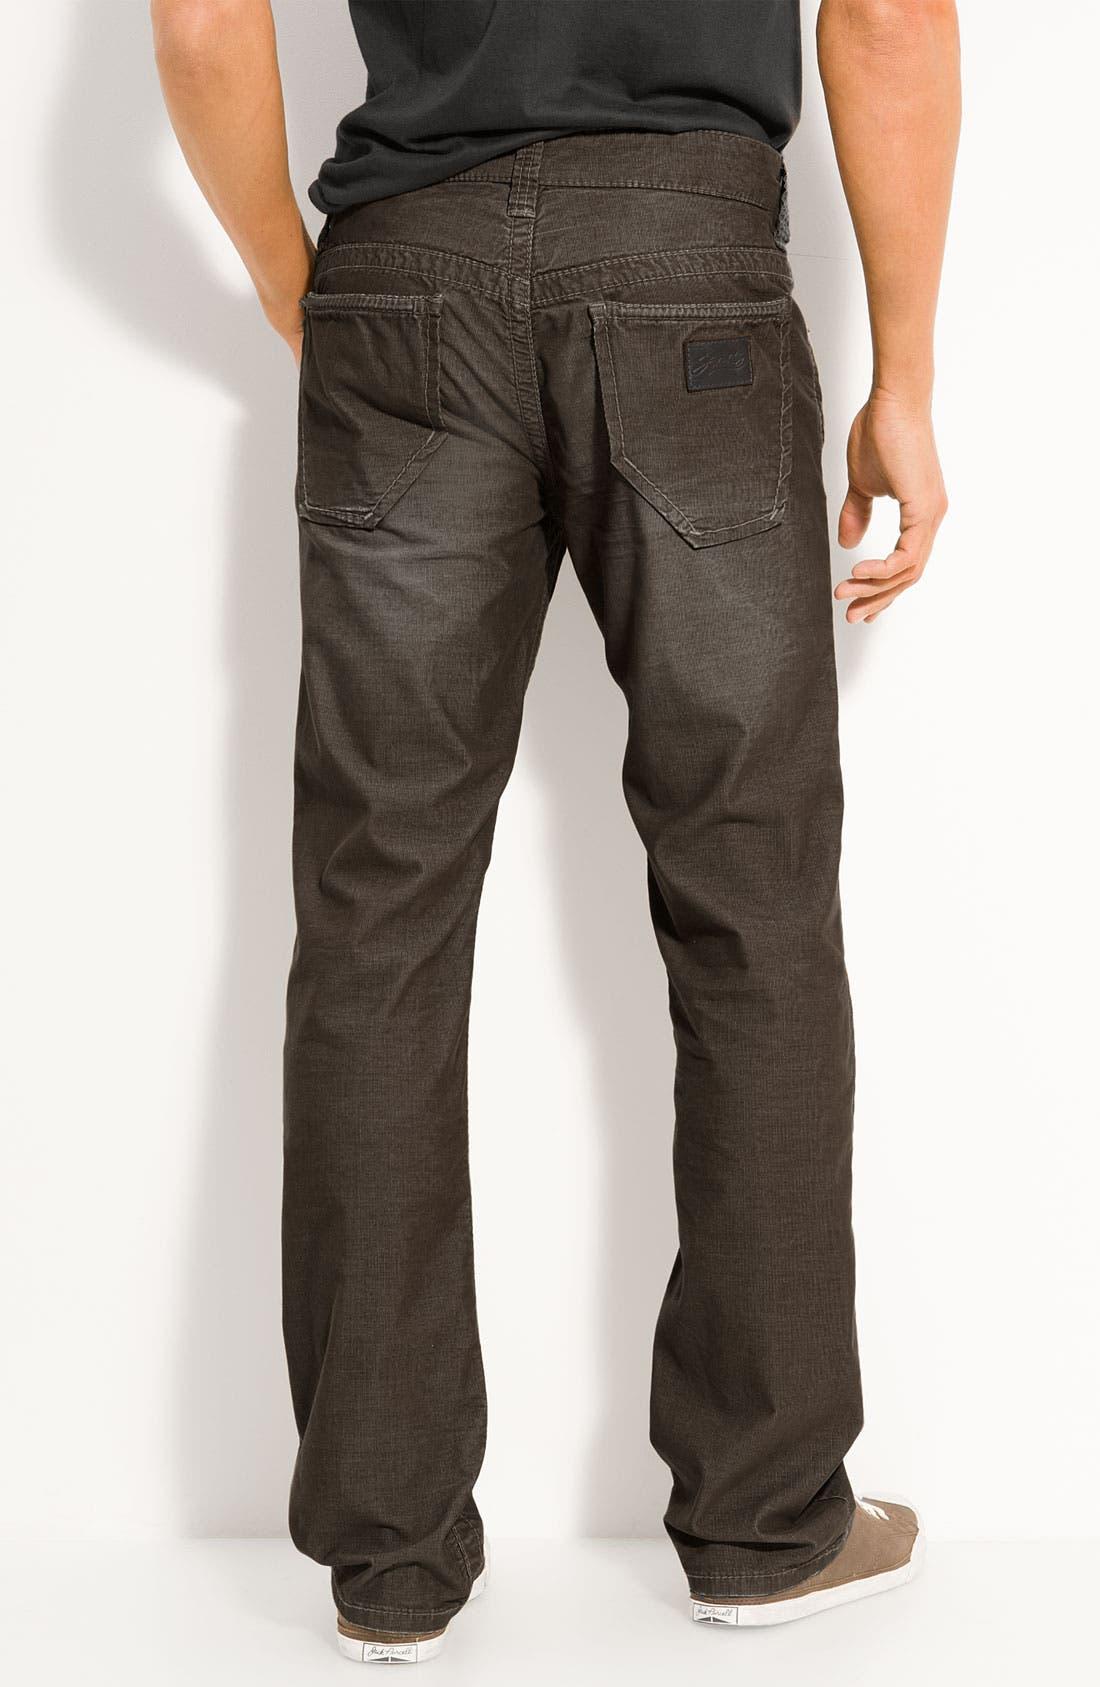 Main Image - Stitch's Jeans 'Texas' Straight Leg Corduroy Pants